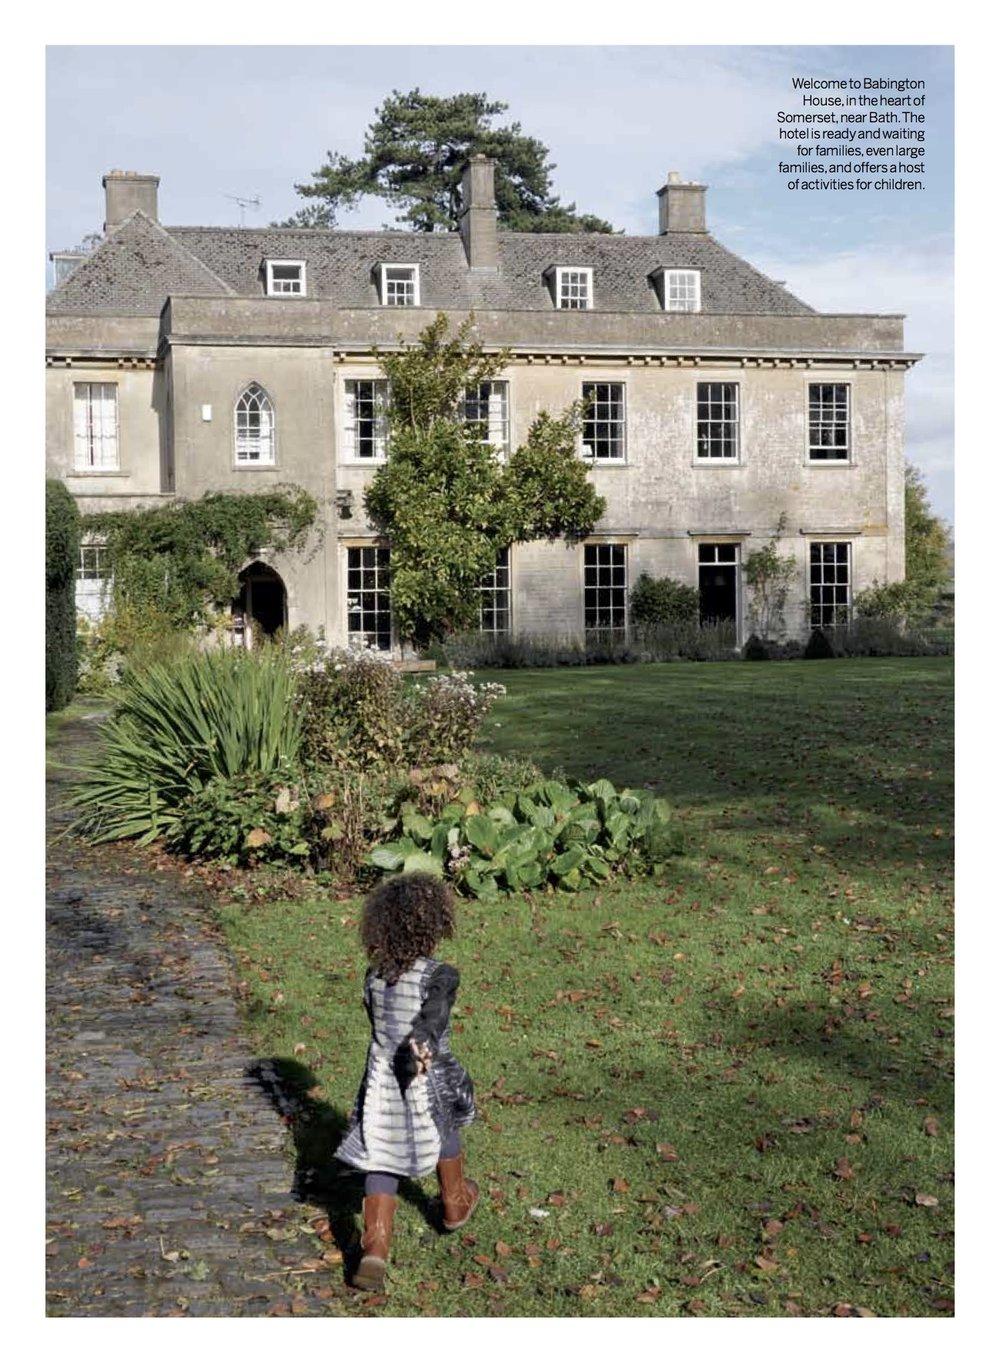 Babington House for a week end